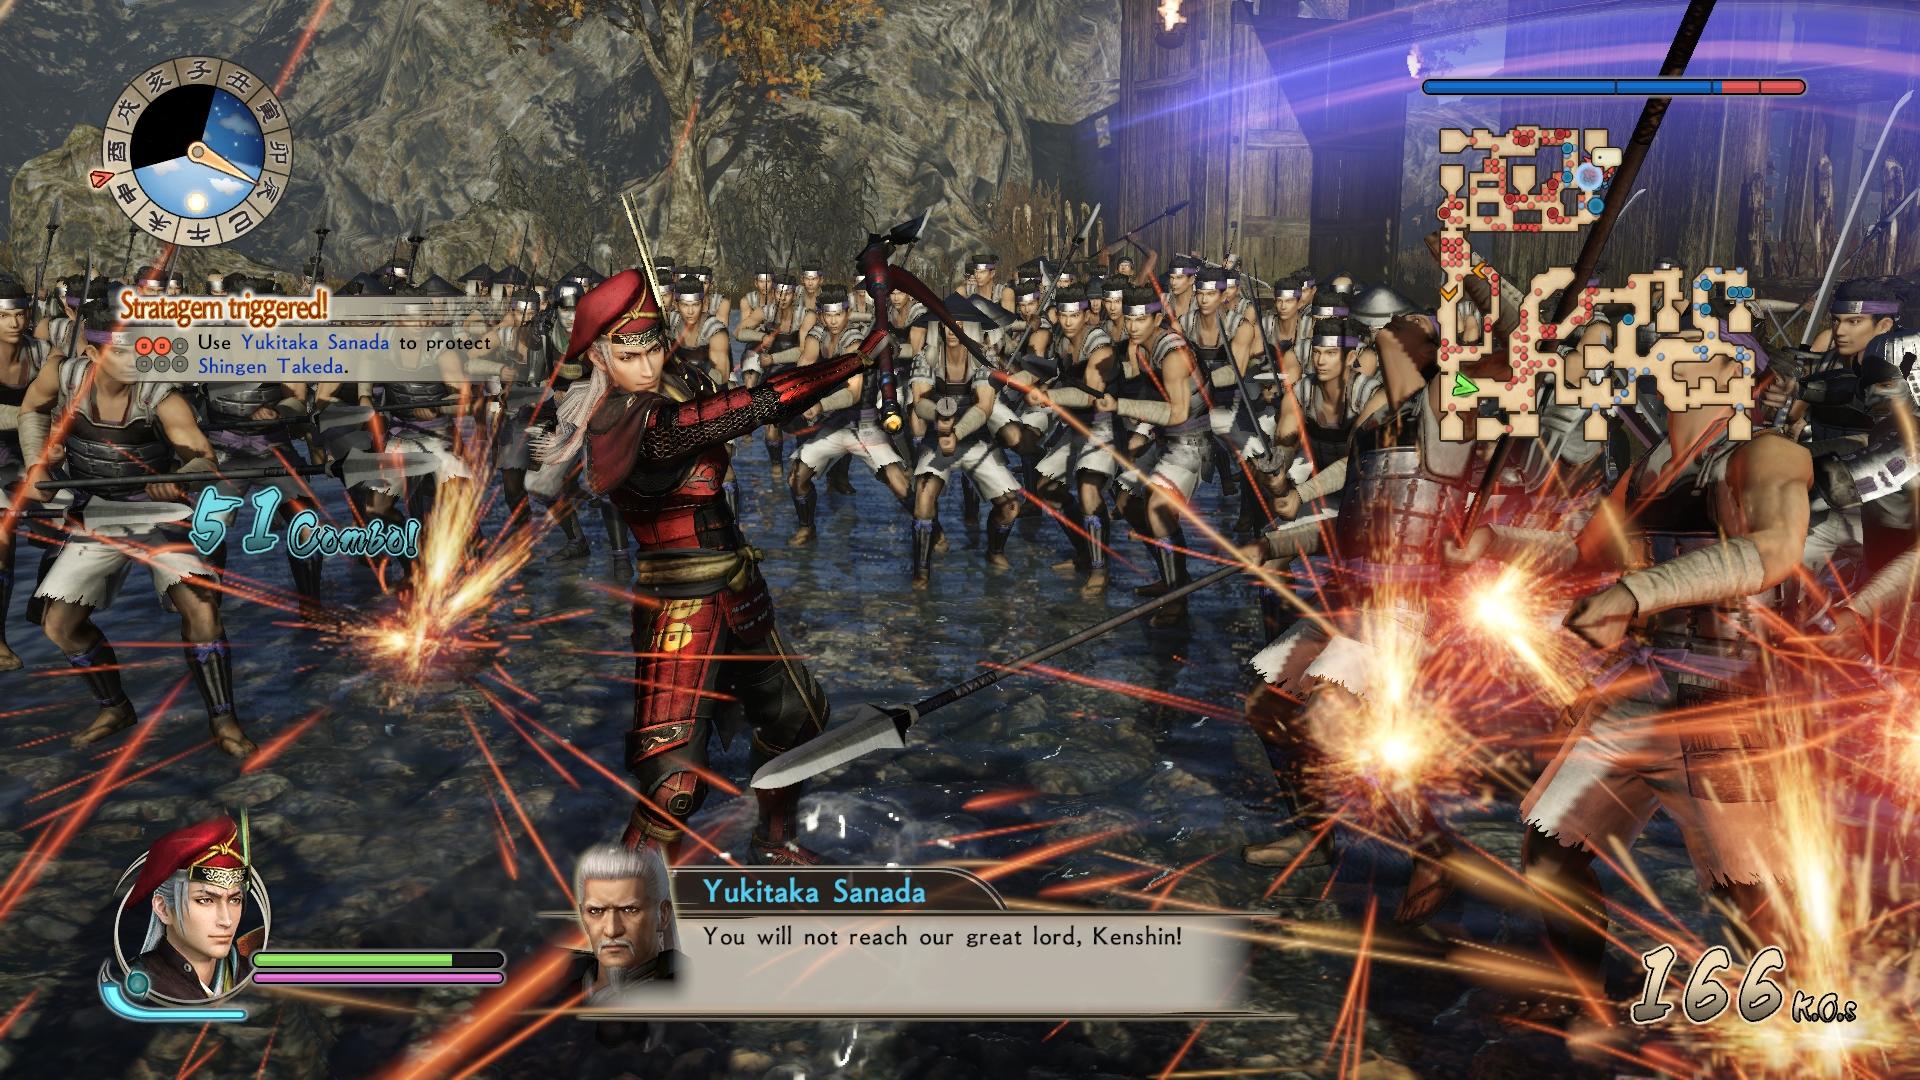 Detaily bojového systému v Samurai Warriors: Spirit of Sanada 142494